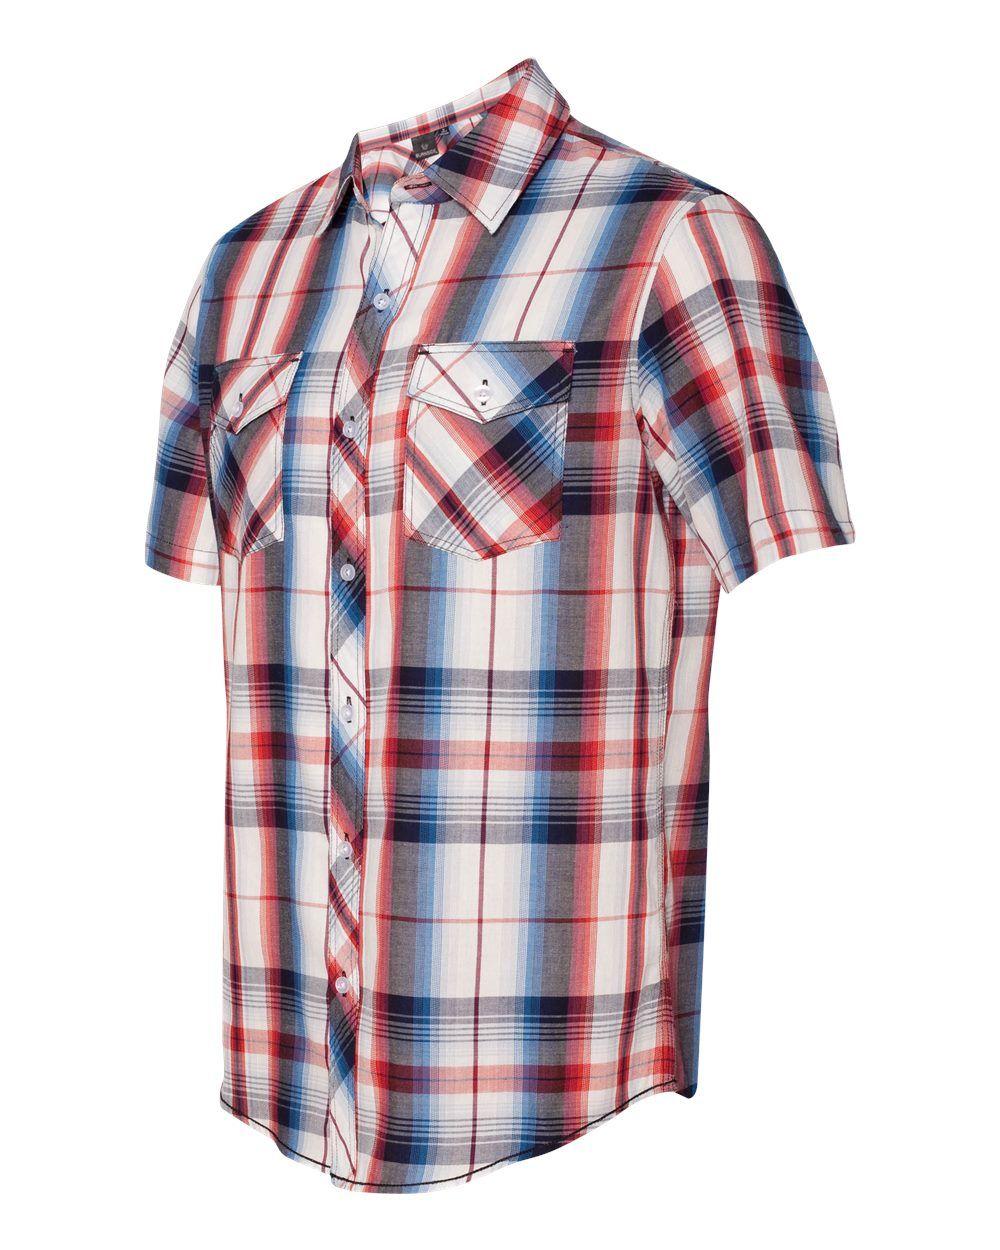 Flannel shirt apron  Burnside B  Plaid Short Sleeve Shirt  Wholesale and Bulk